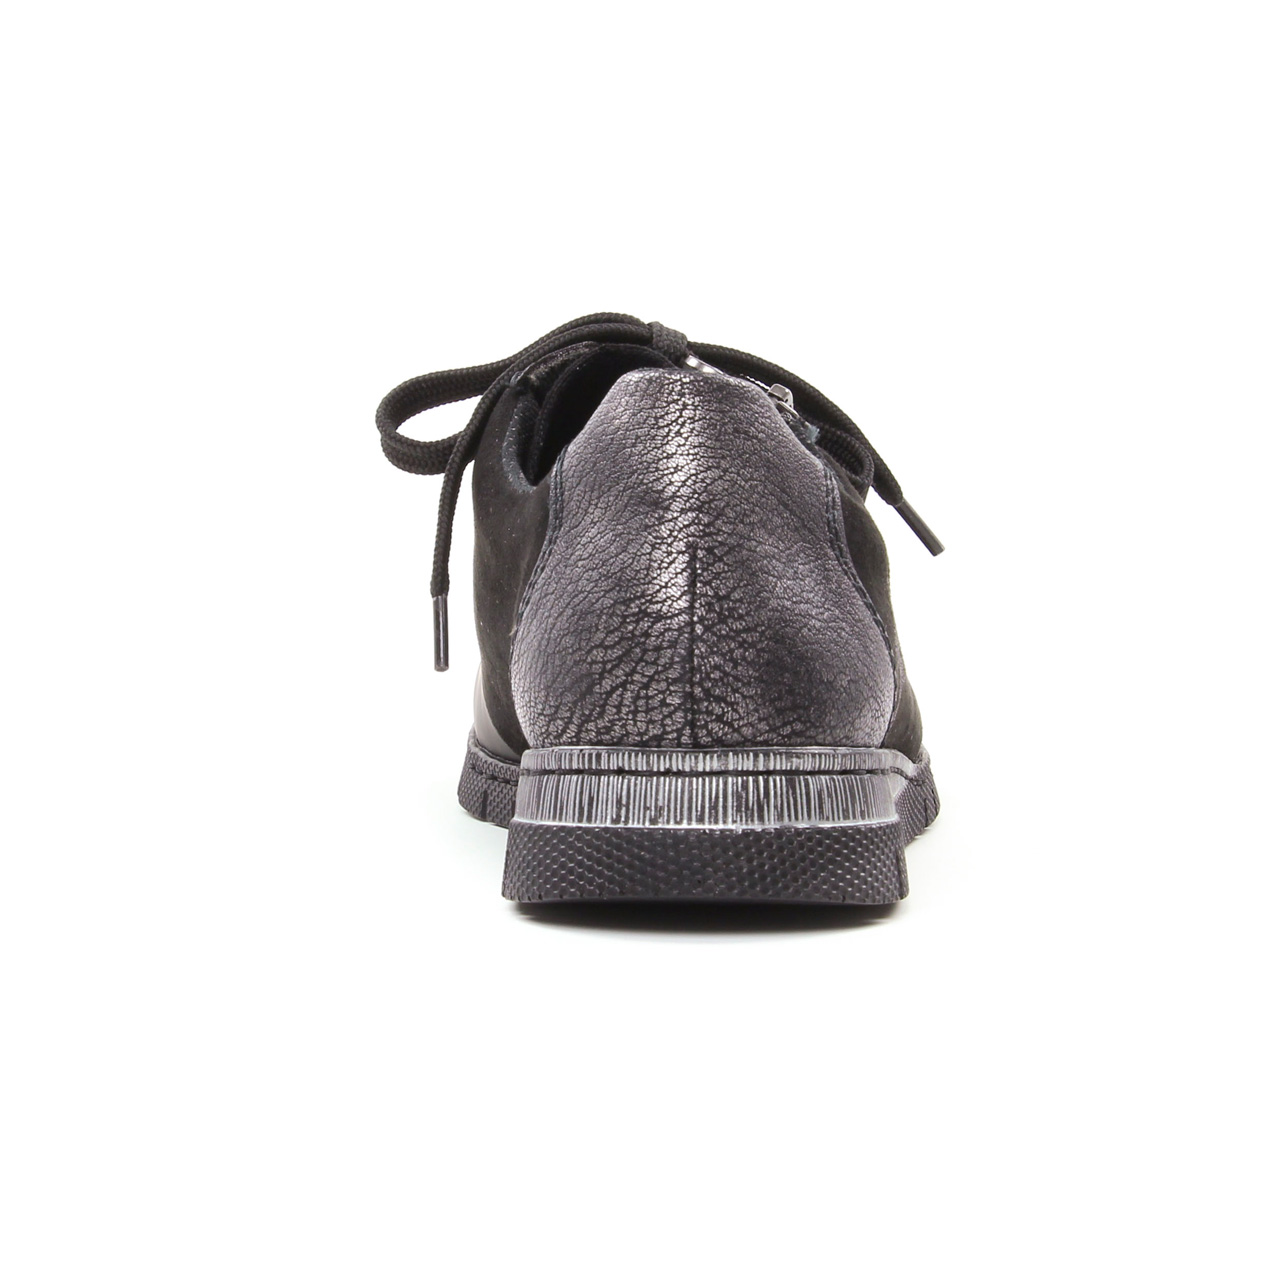 Rieker N5322 02 Schwarz | basket mode noir automne hiver